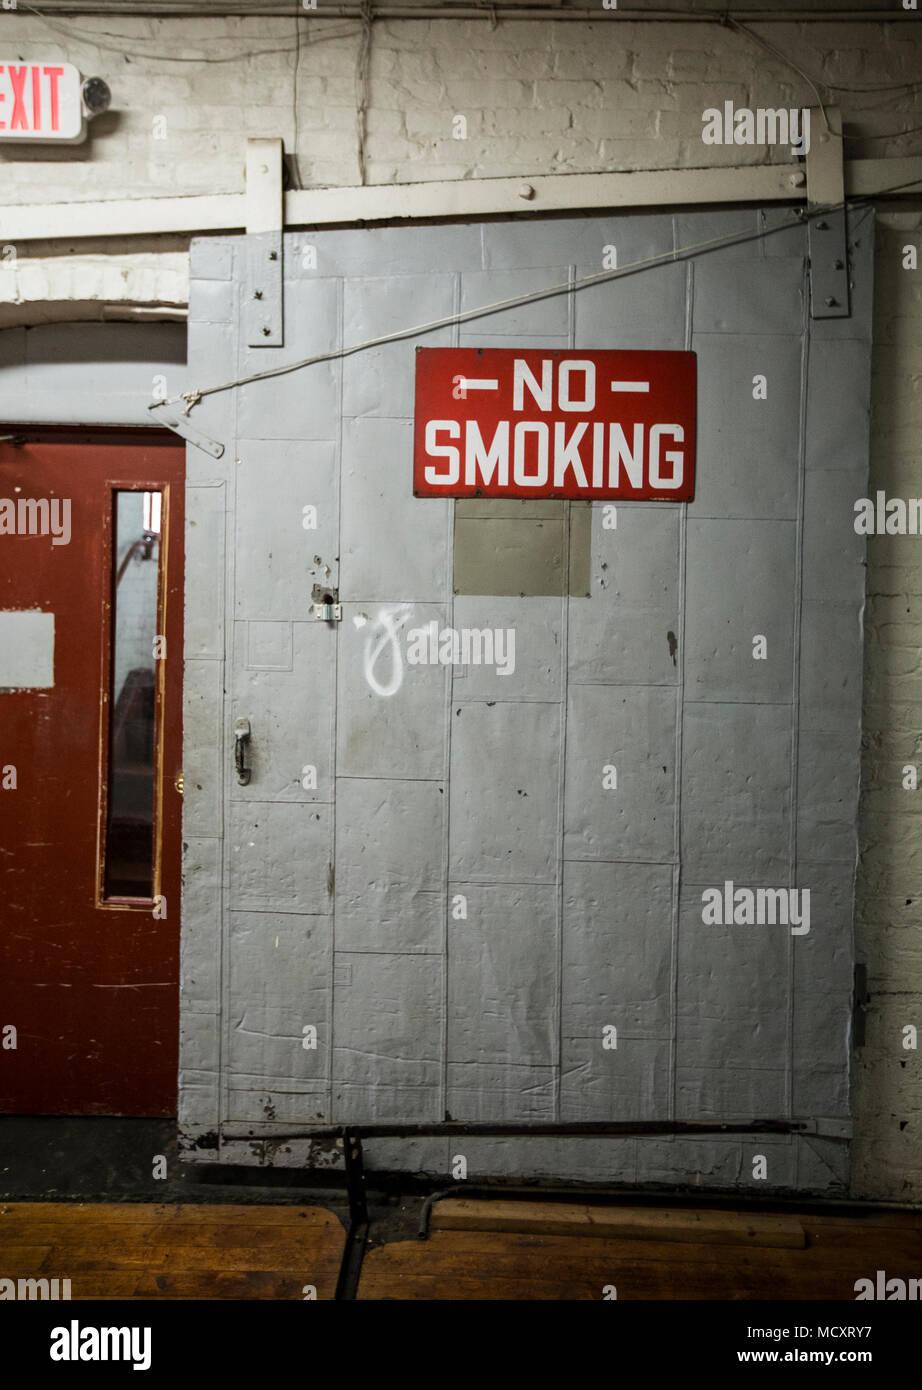 Sliding Door With A No Smoking Sign Stock Photo 180069099 Alamy